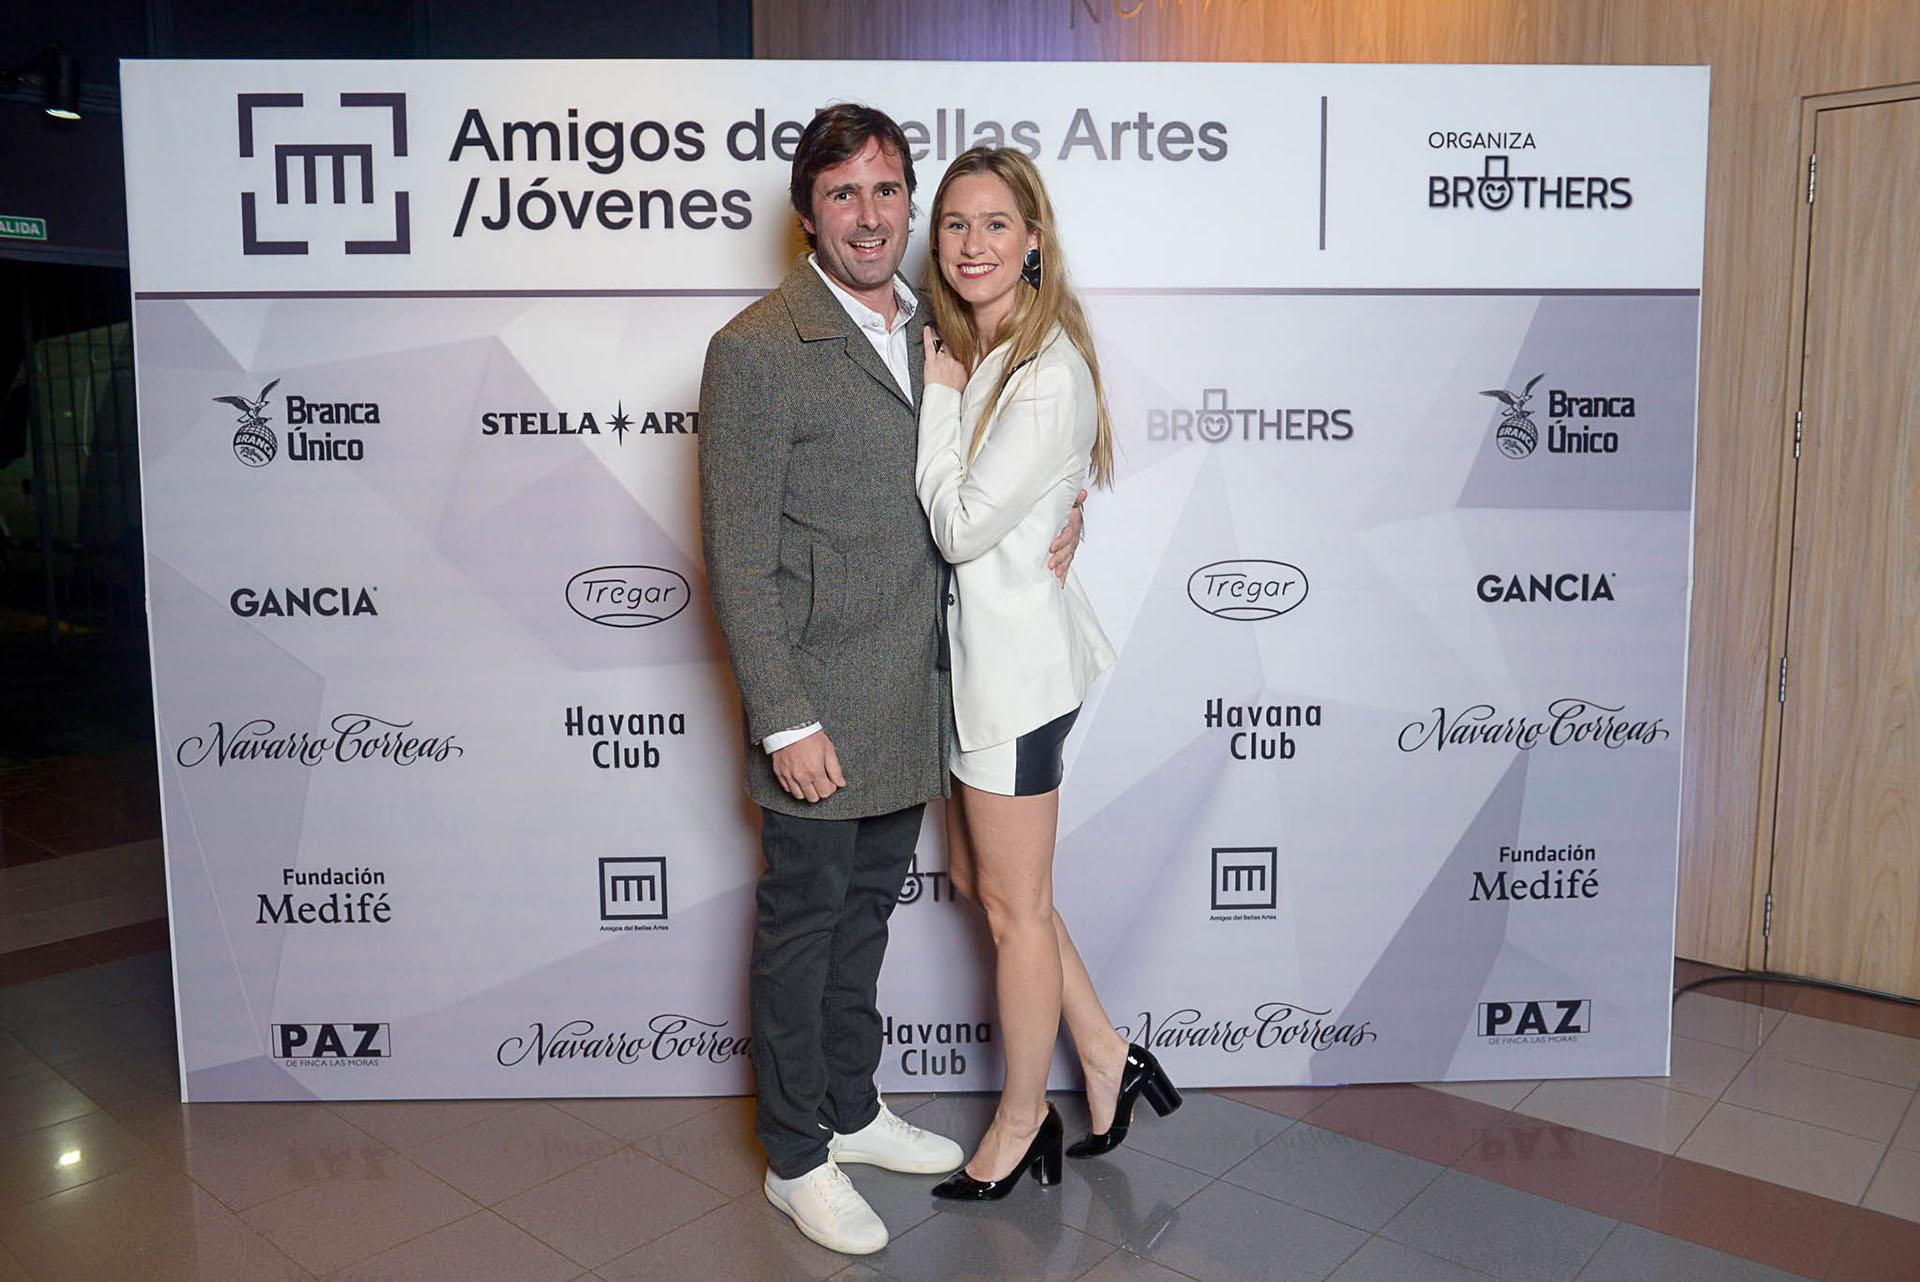 Nicolás Durrieu y Petty Saenz Rosas